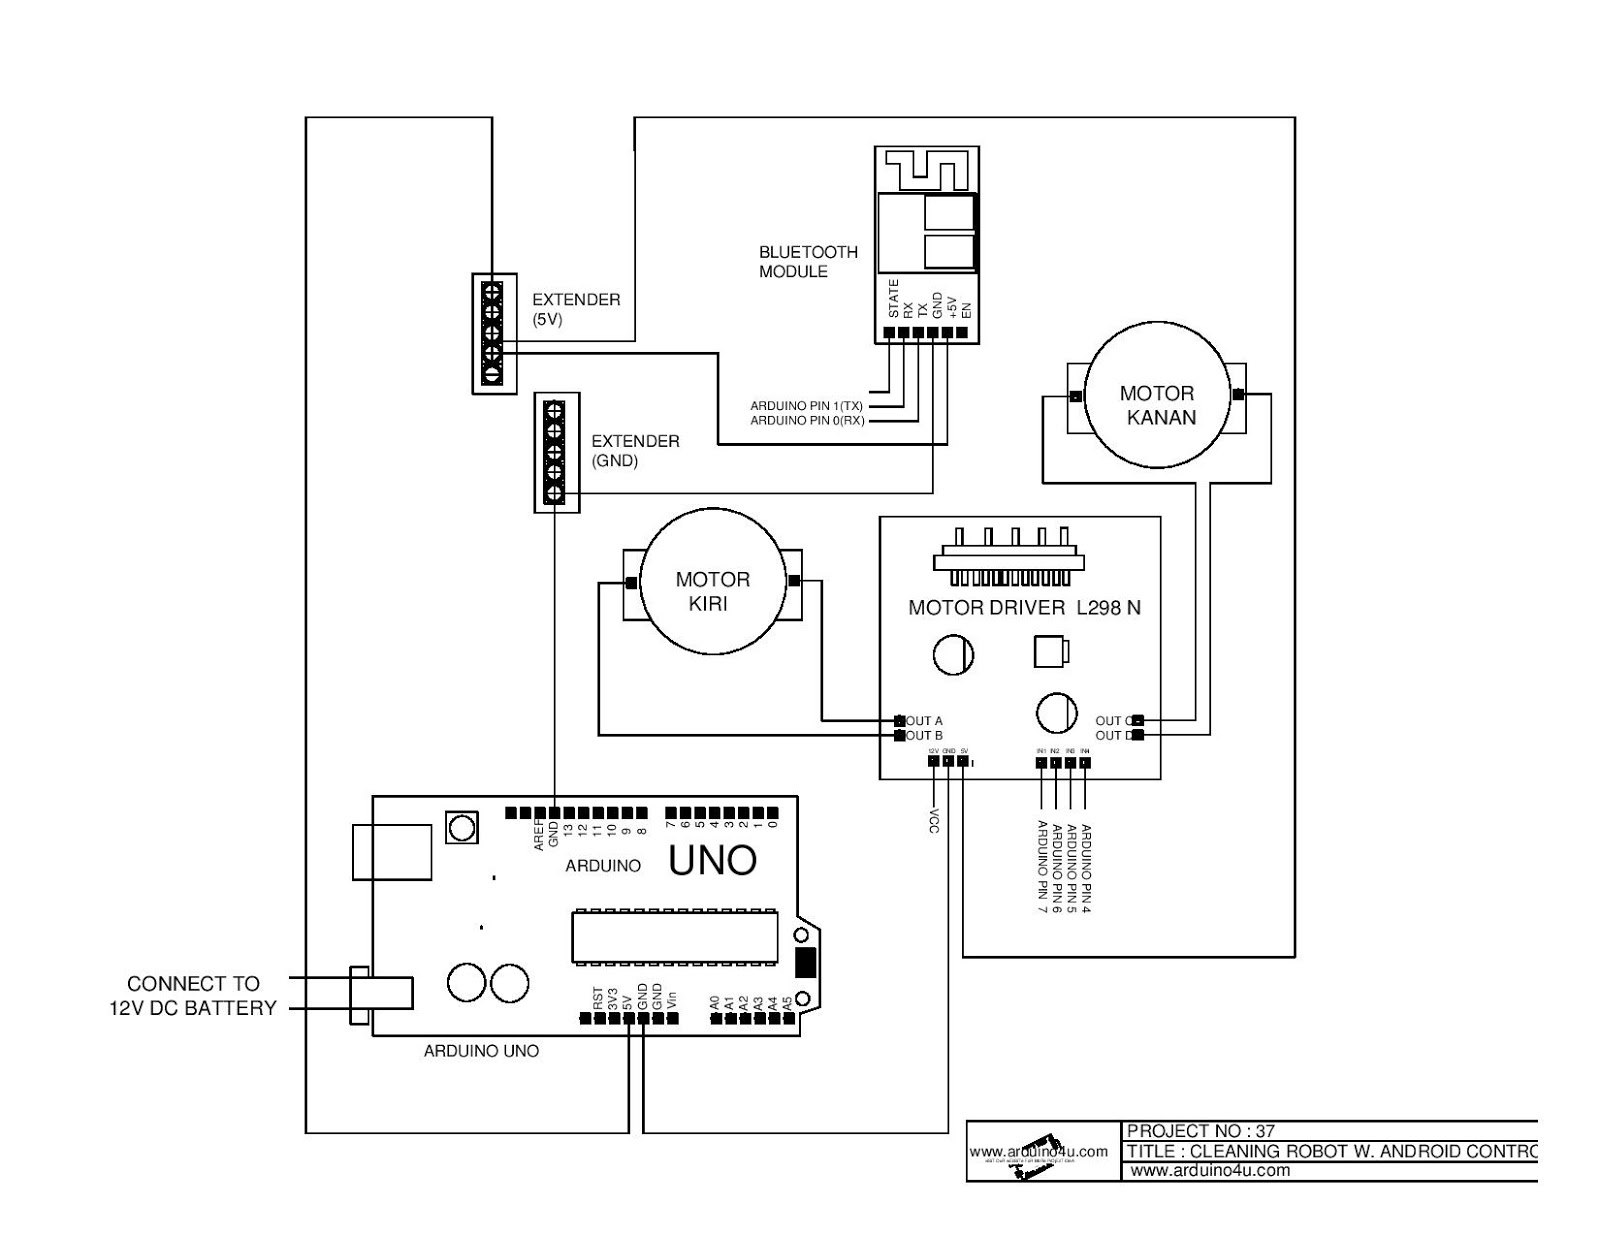 Projek Elektronik Arduino4u.com: 37.Cleaning robot with